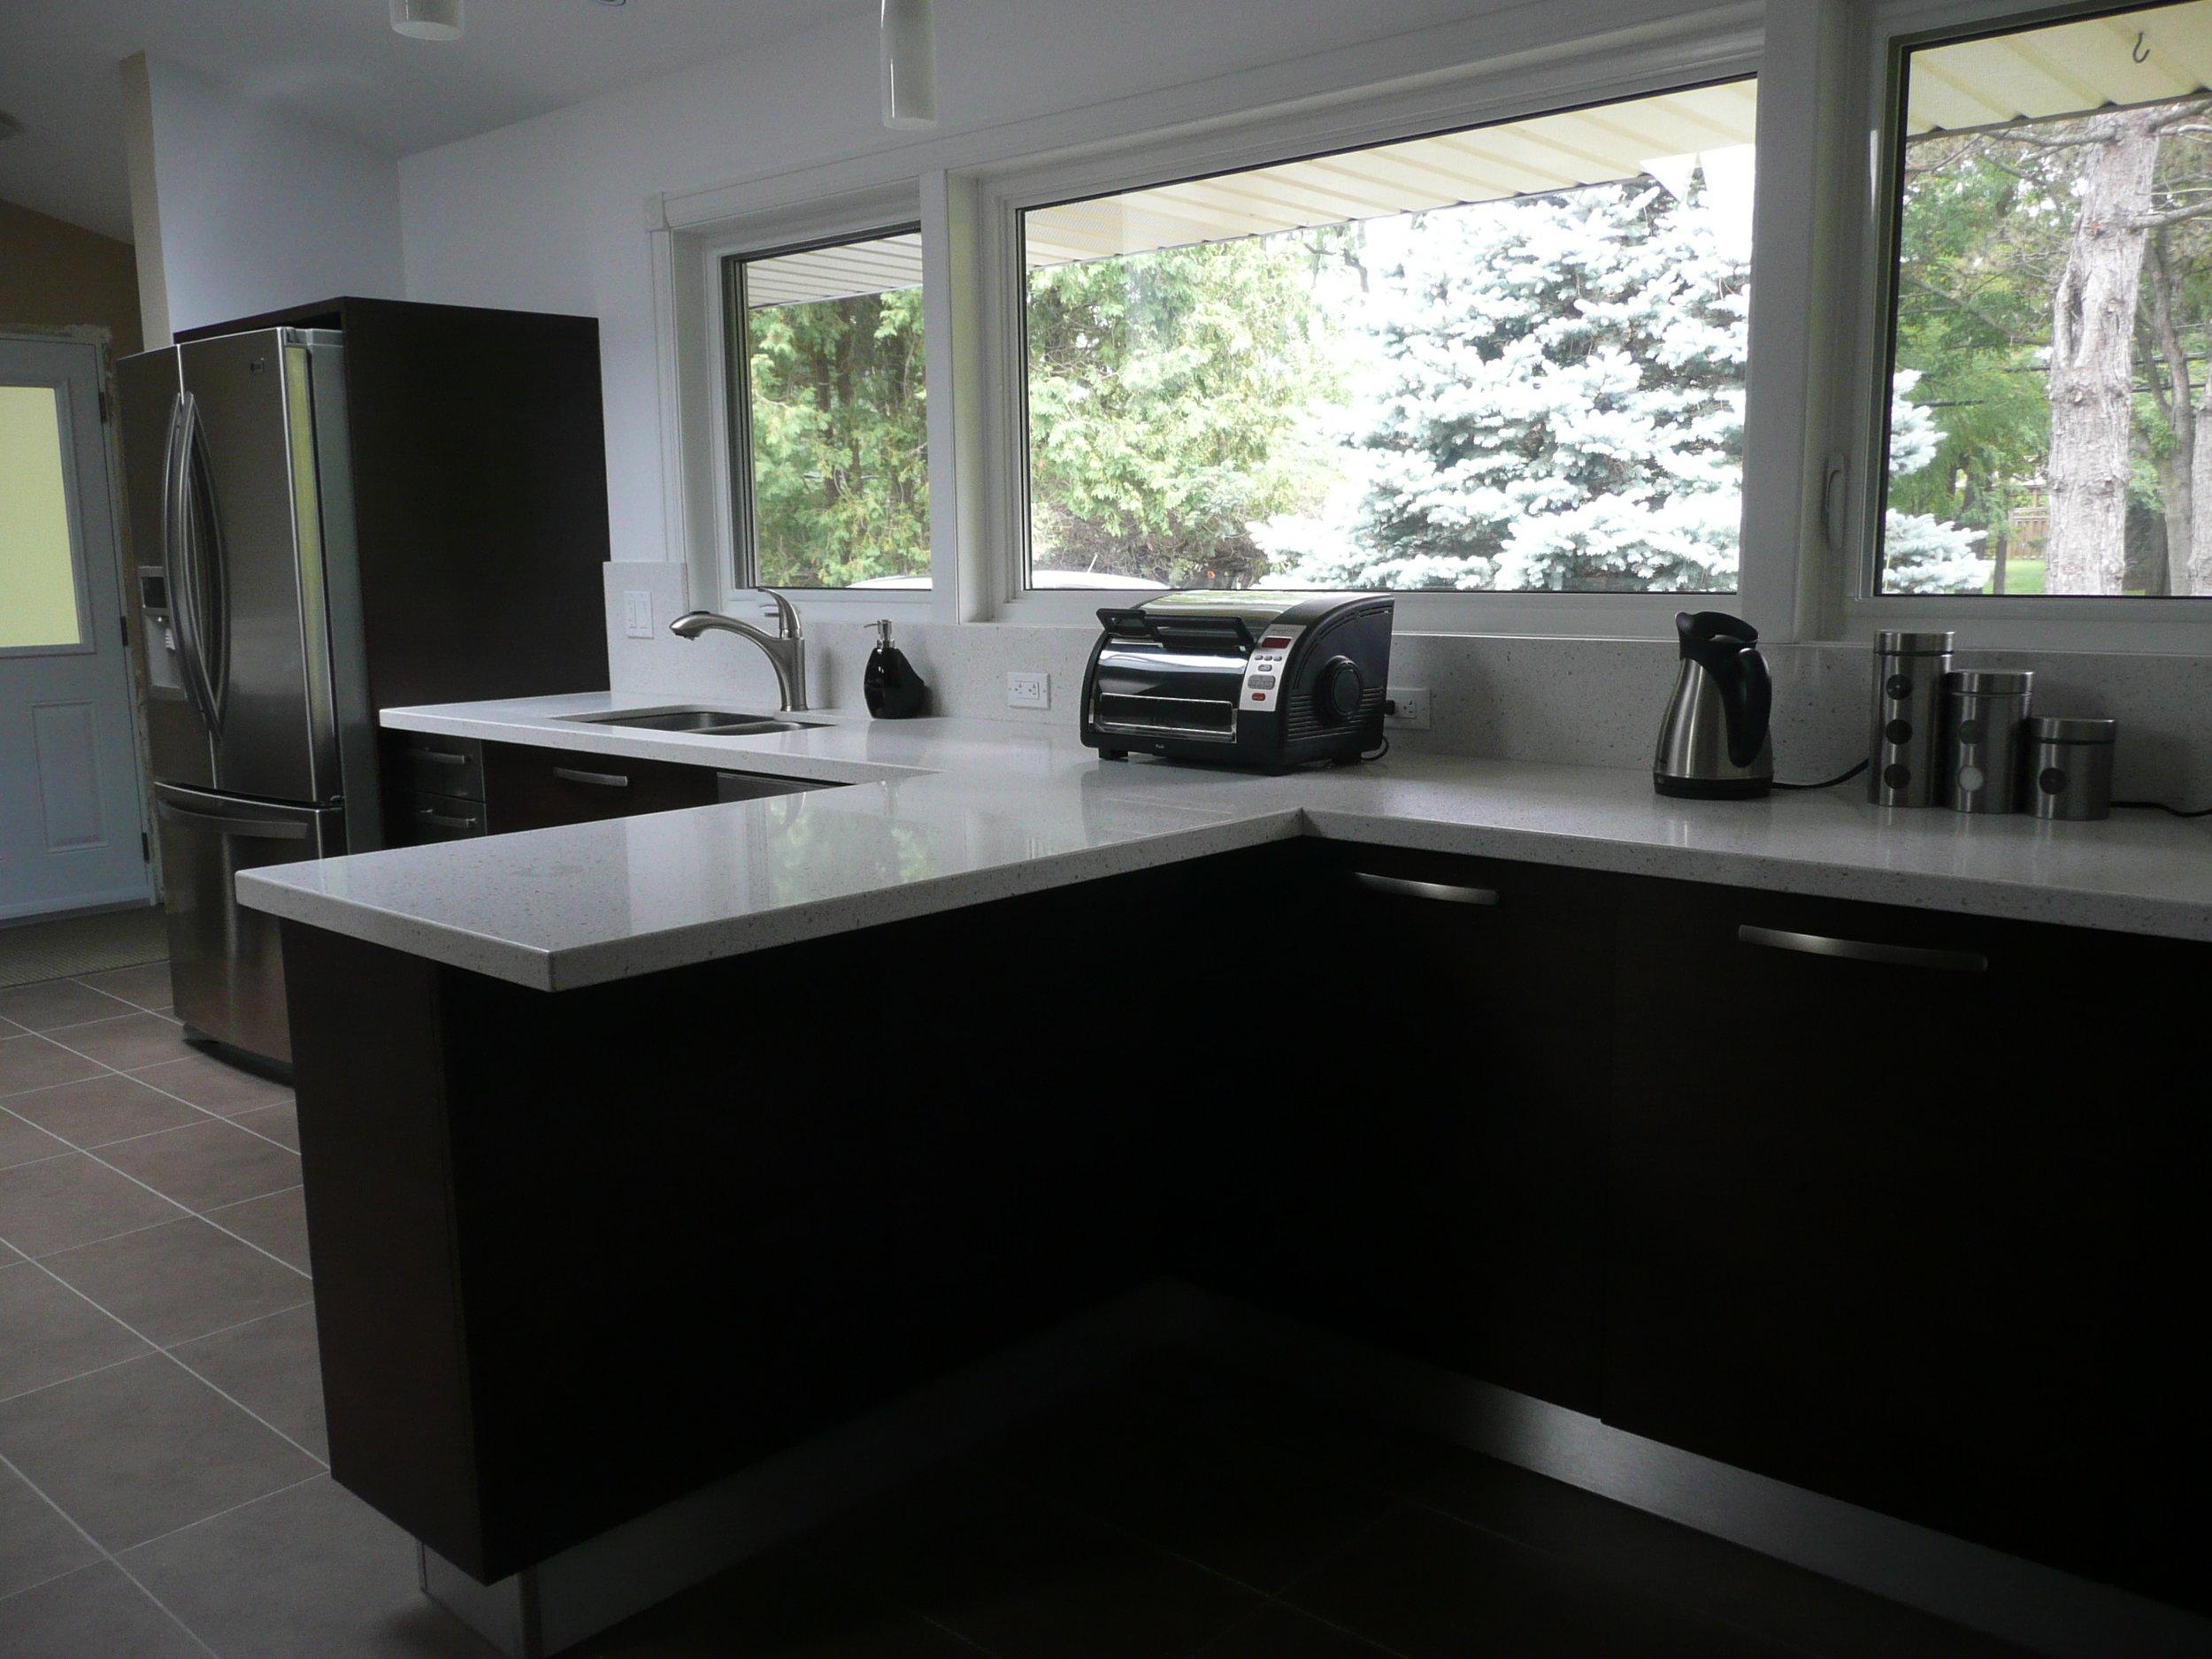 Kitchen 15 Pic 3.JPG